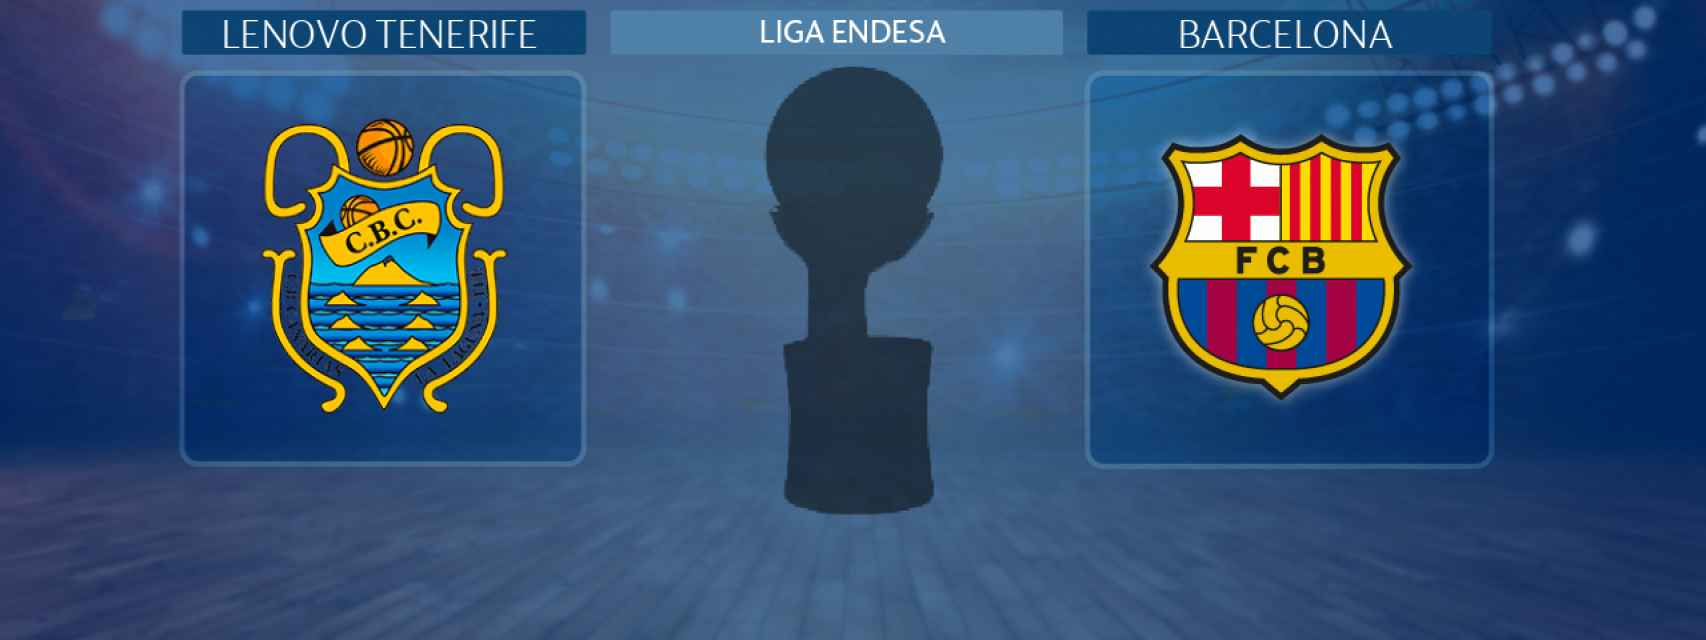 Lenovo Tenerife - Barcelona, semifinal de la Liga Endesa